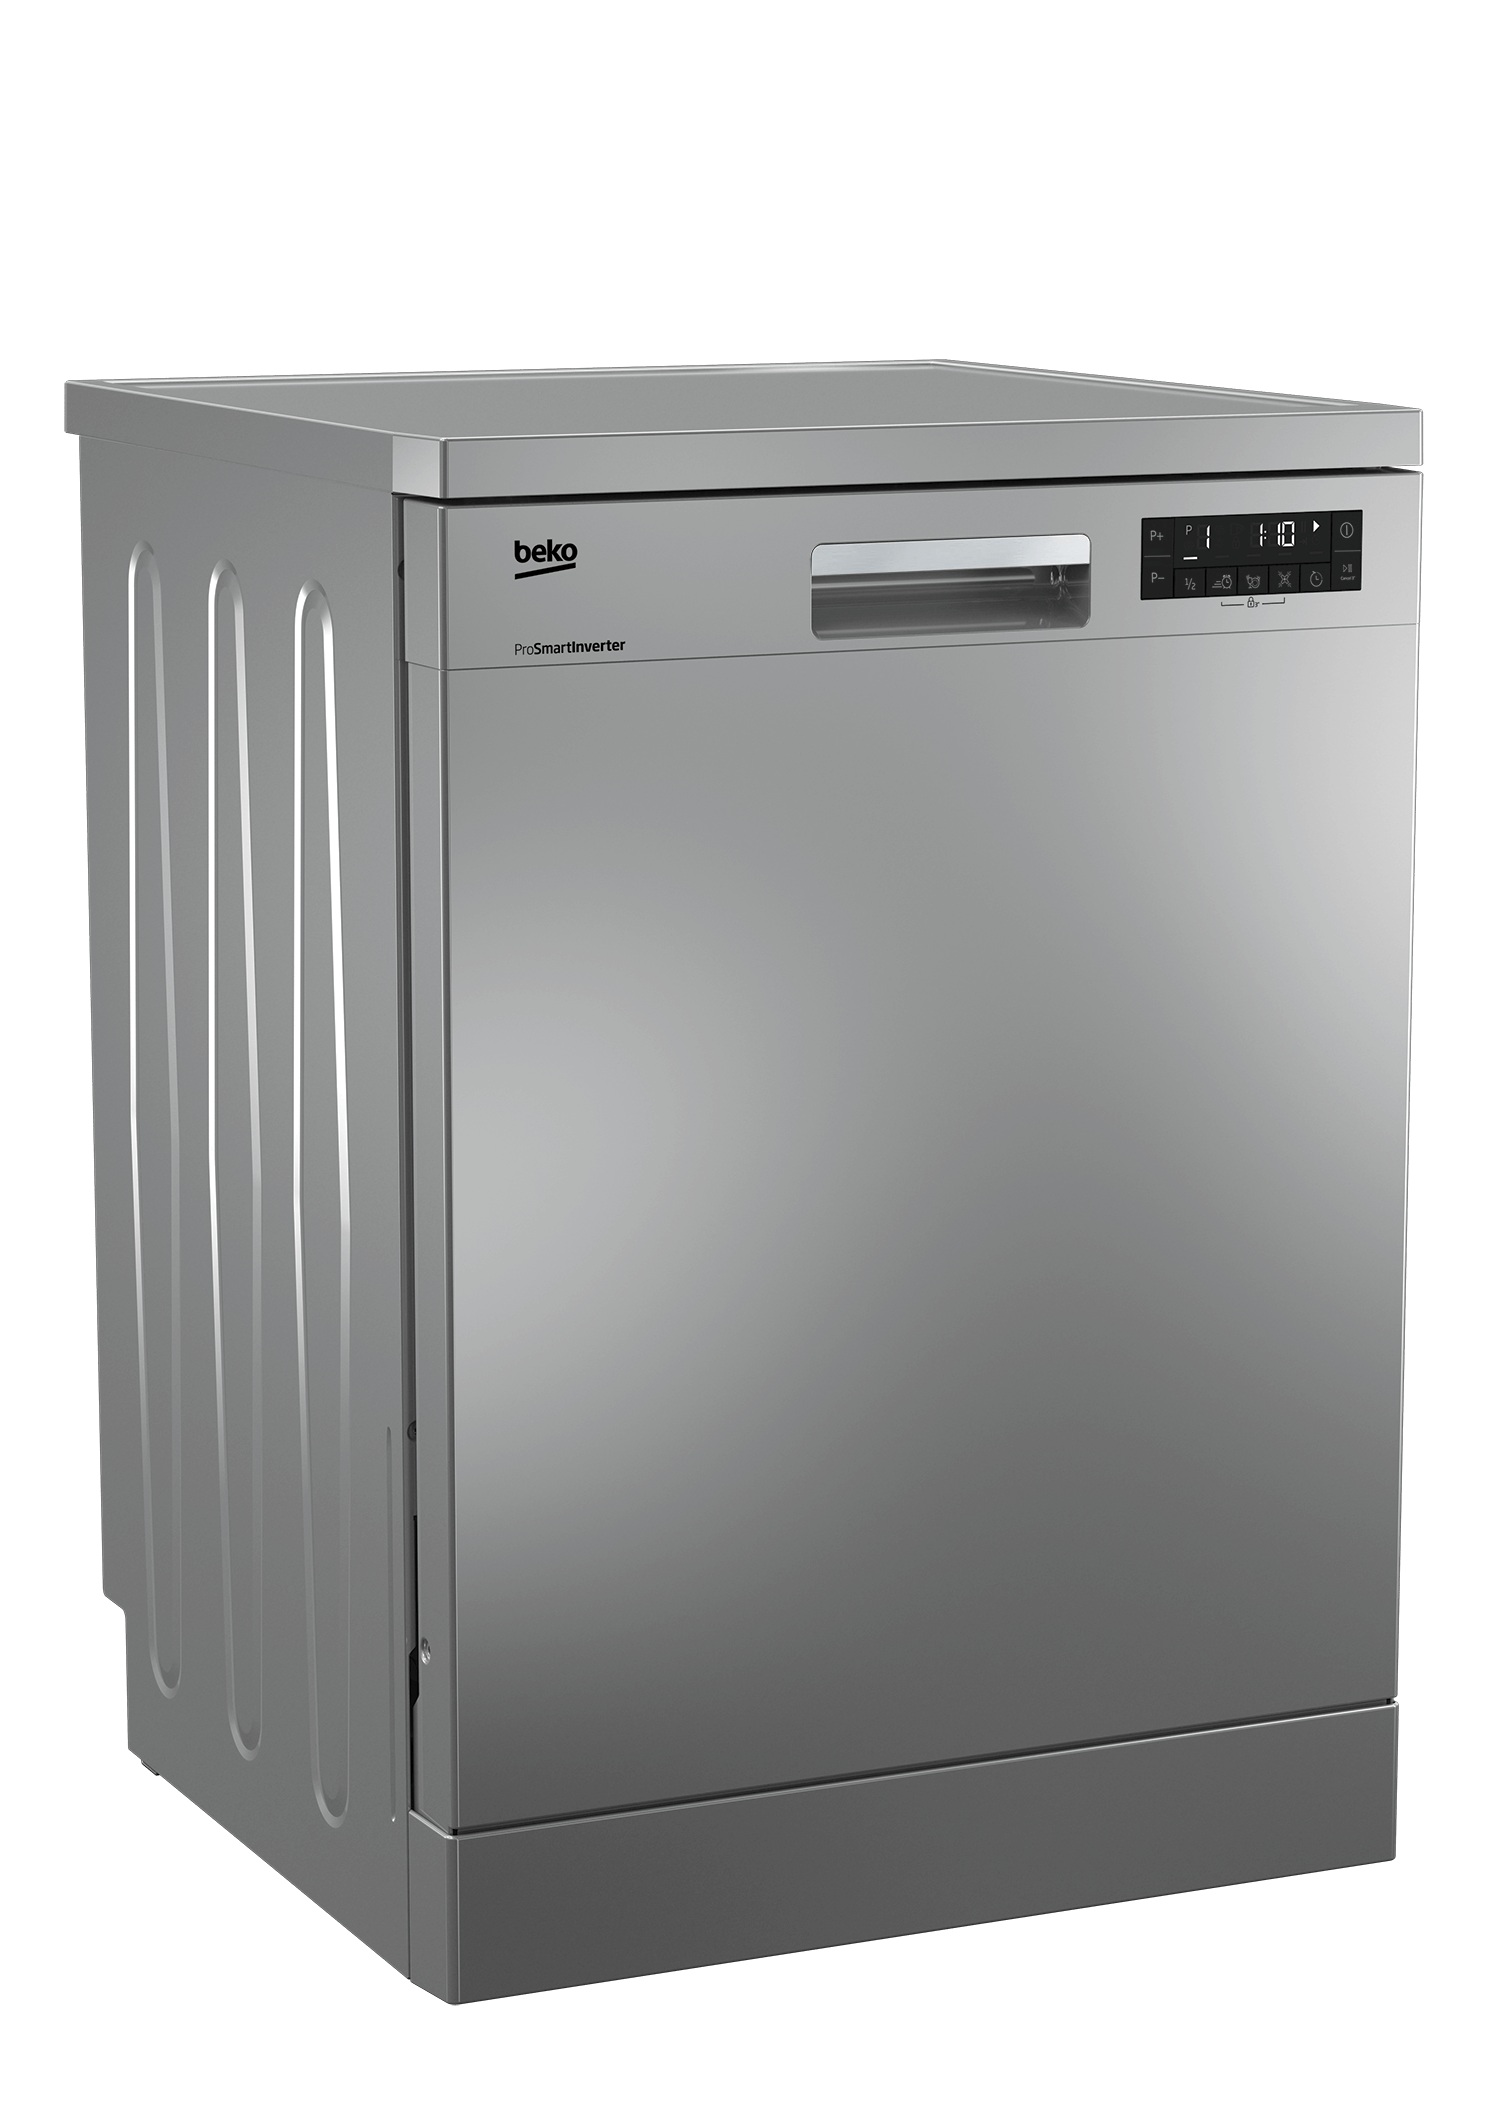 BEKO 8 Programmes Dishwasher DFN28420S